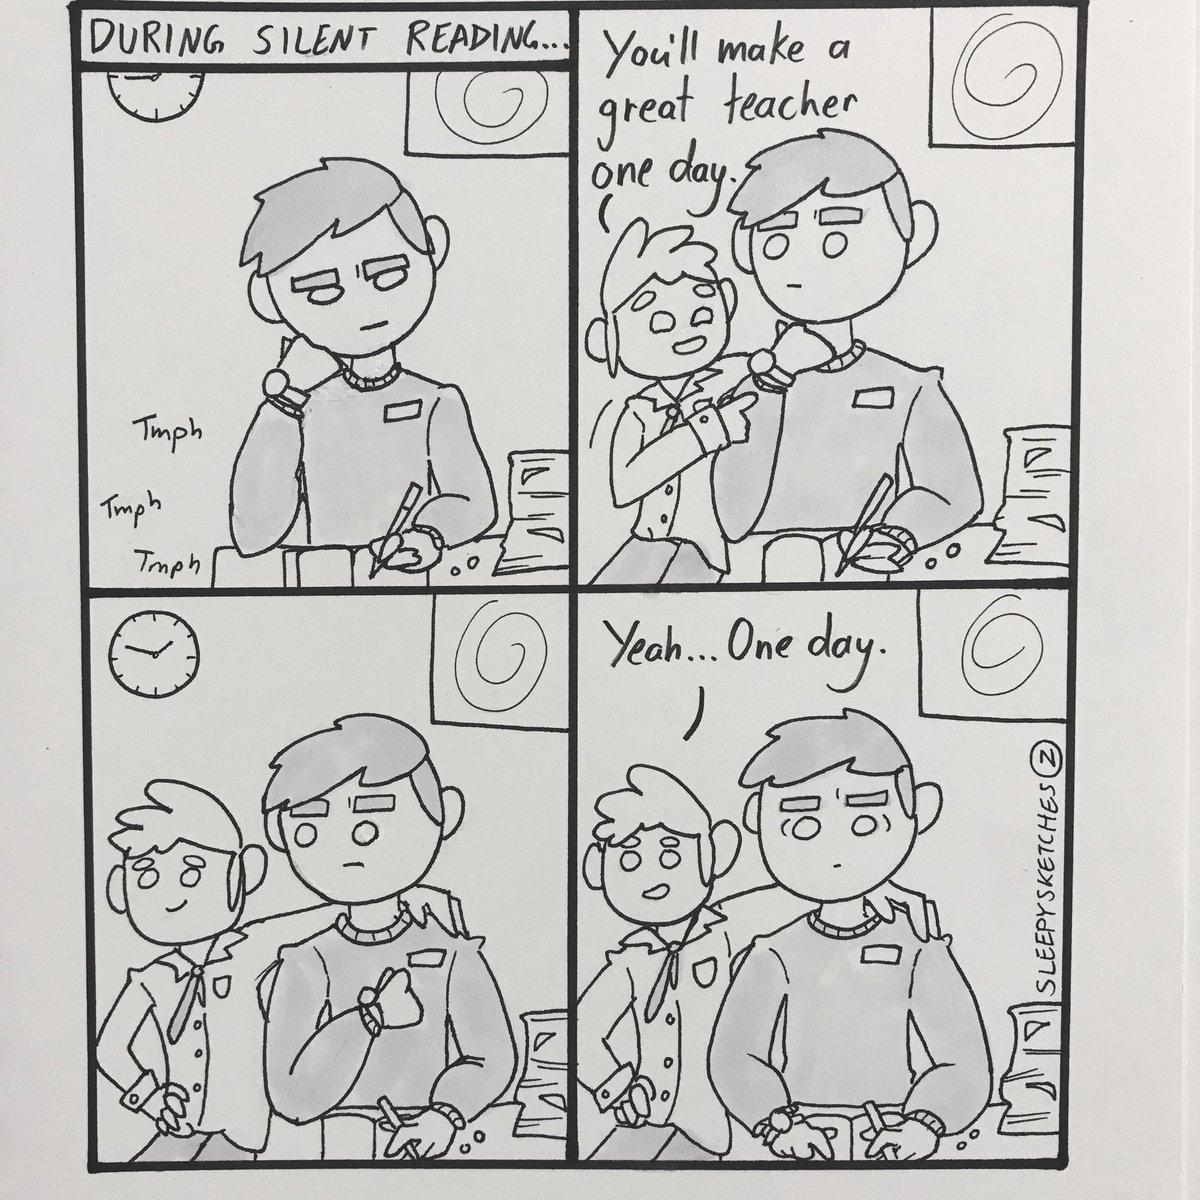 Sleepy sketches